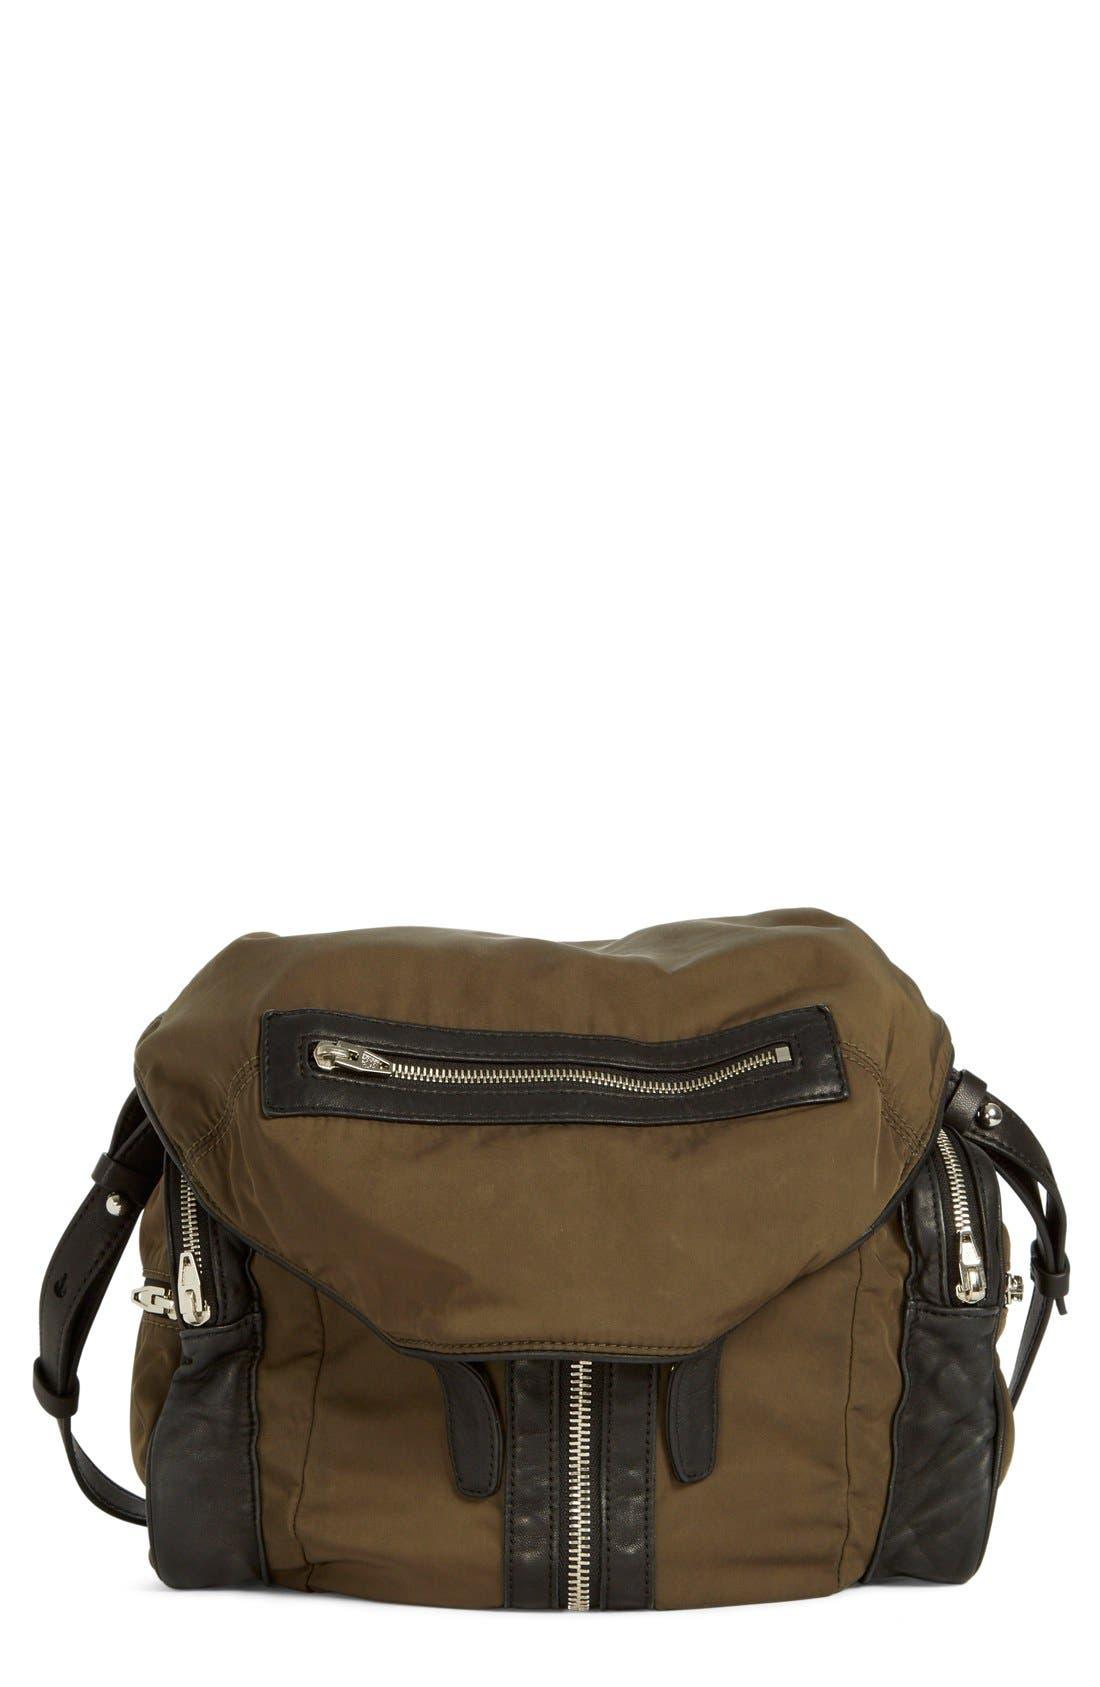 Alternate Image 1 Selected - Alexander Wang 'Marti' Nylon Backpack